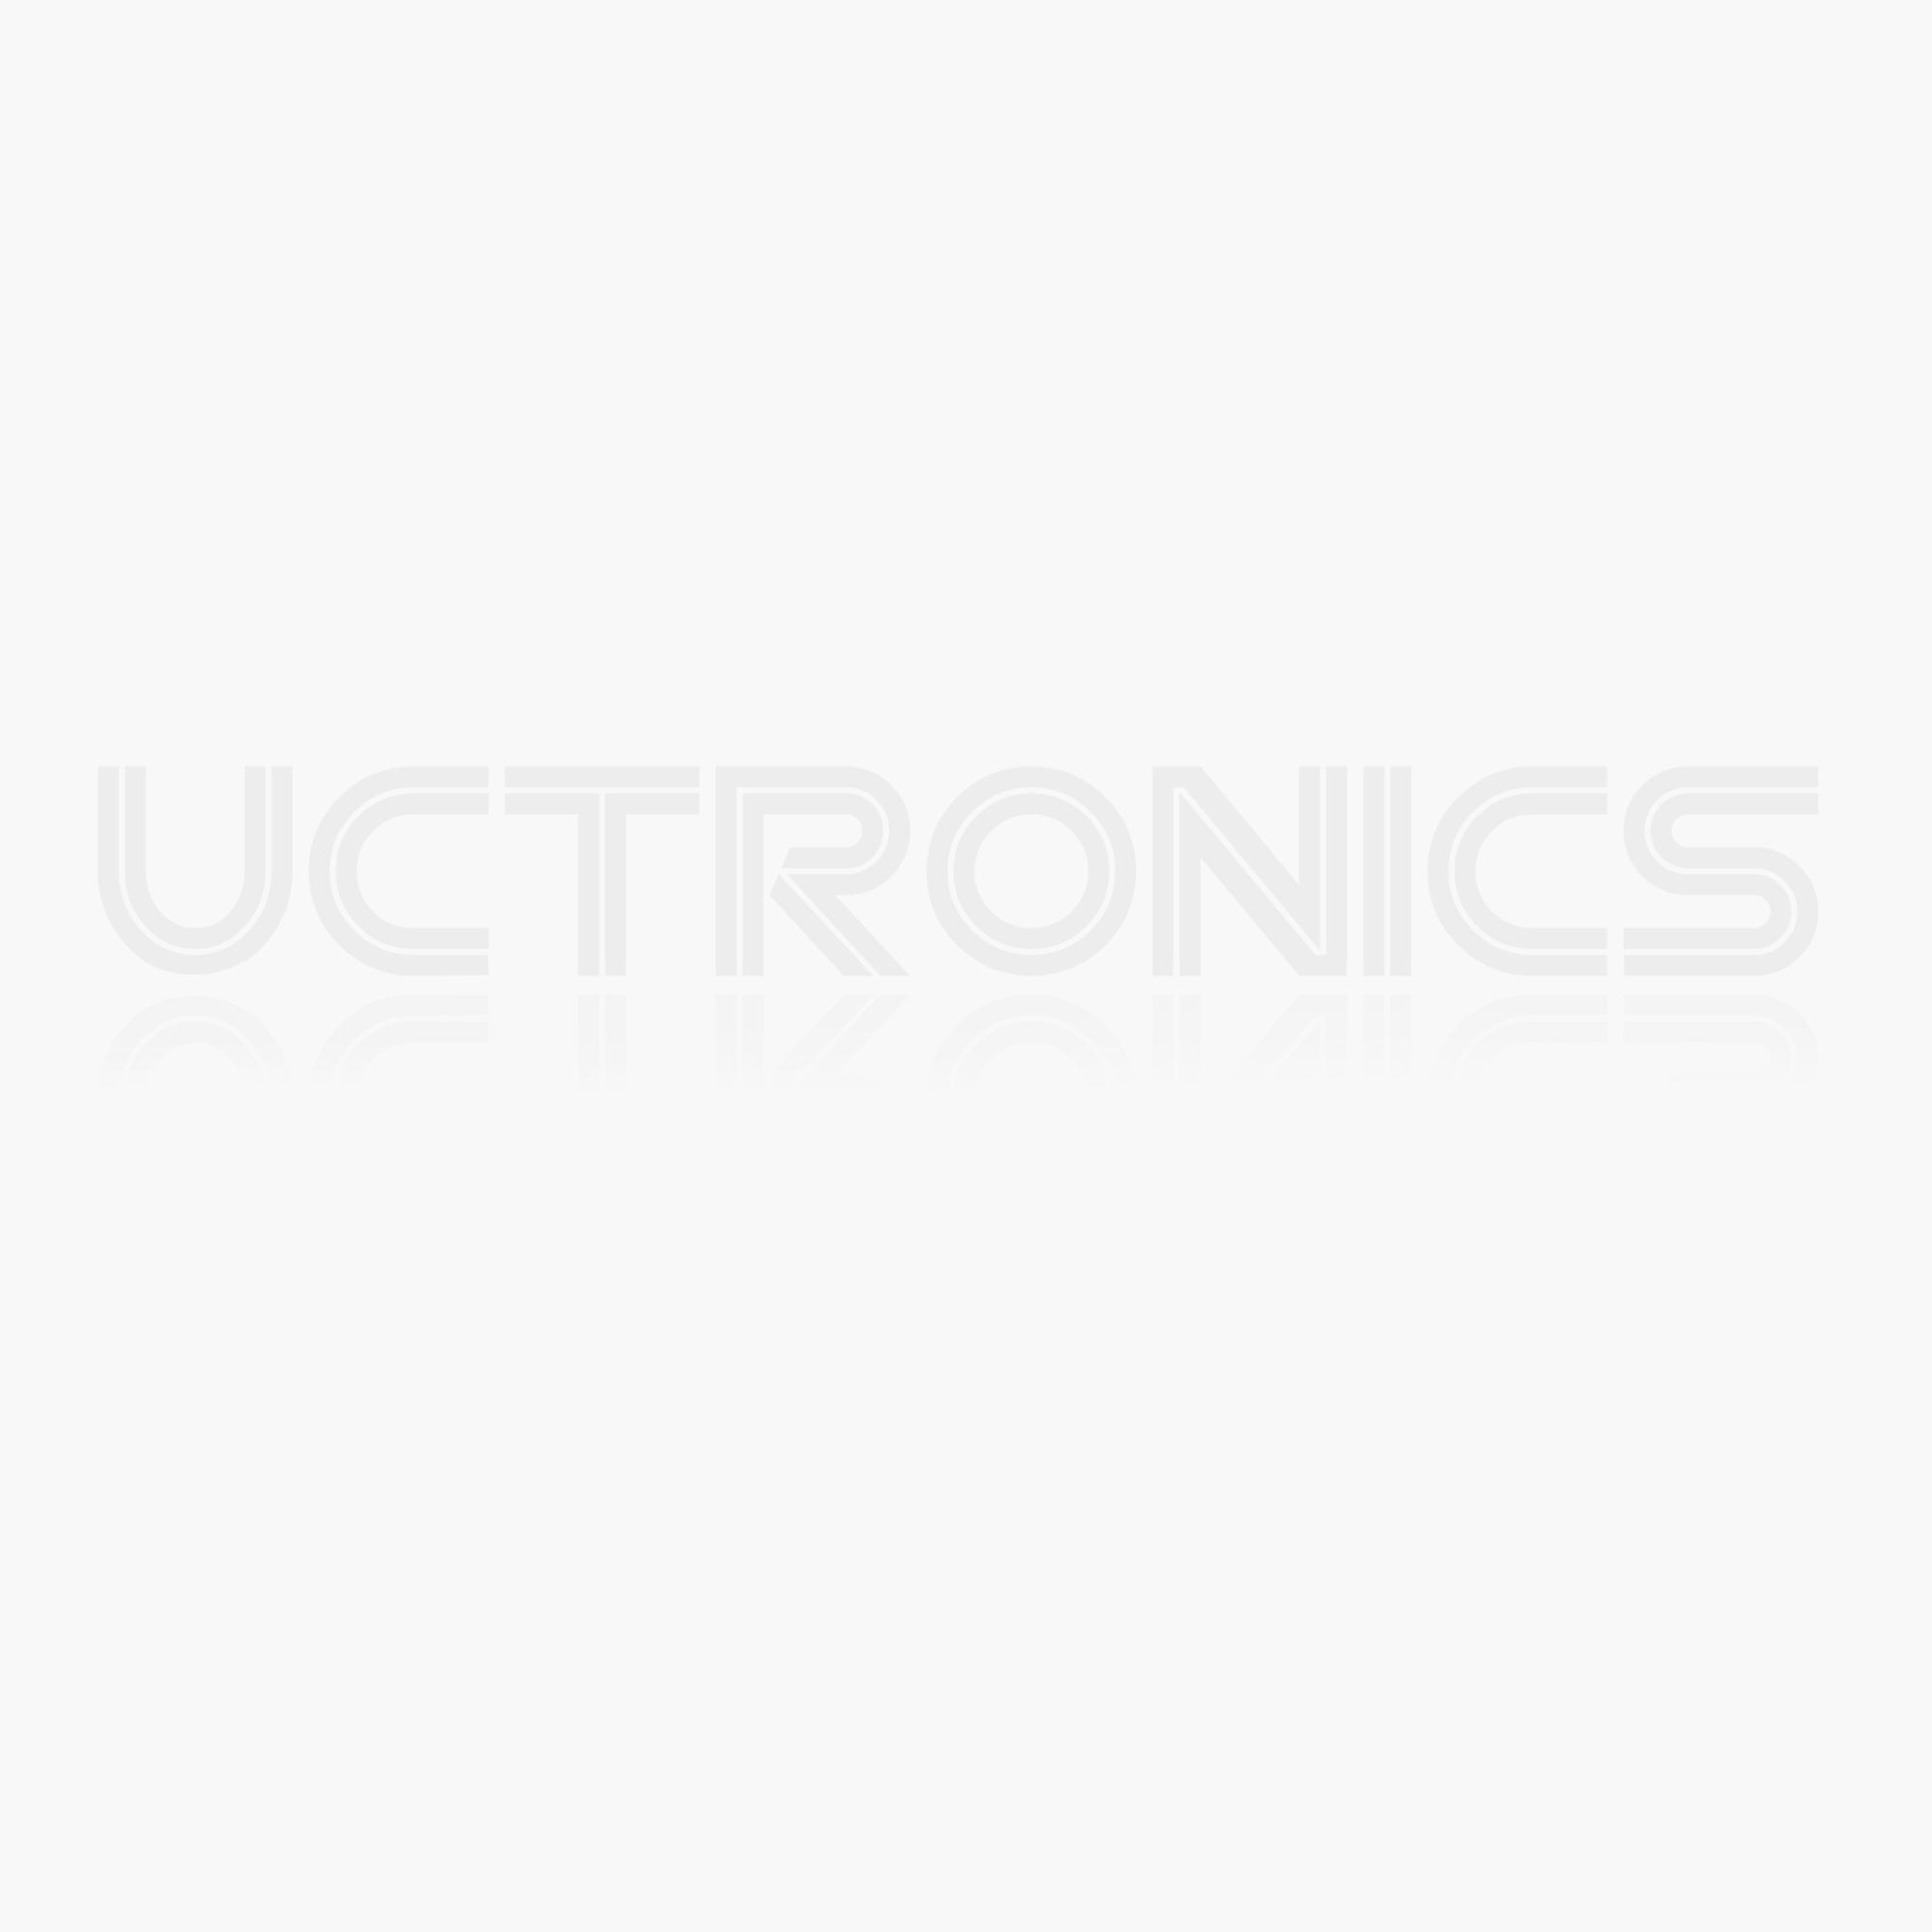 FL-2 100A/75mV Ammeter Shunt